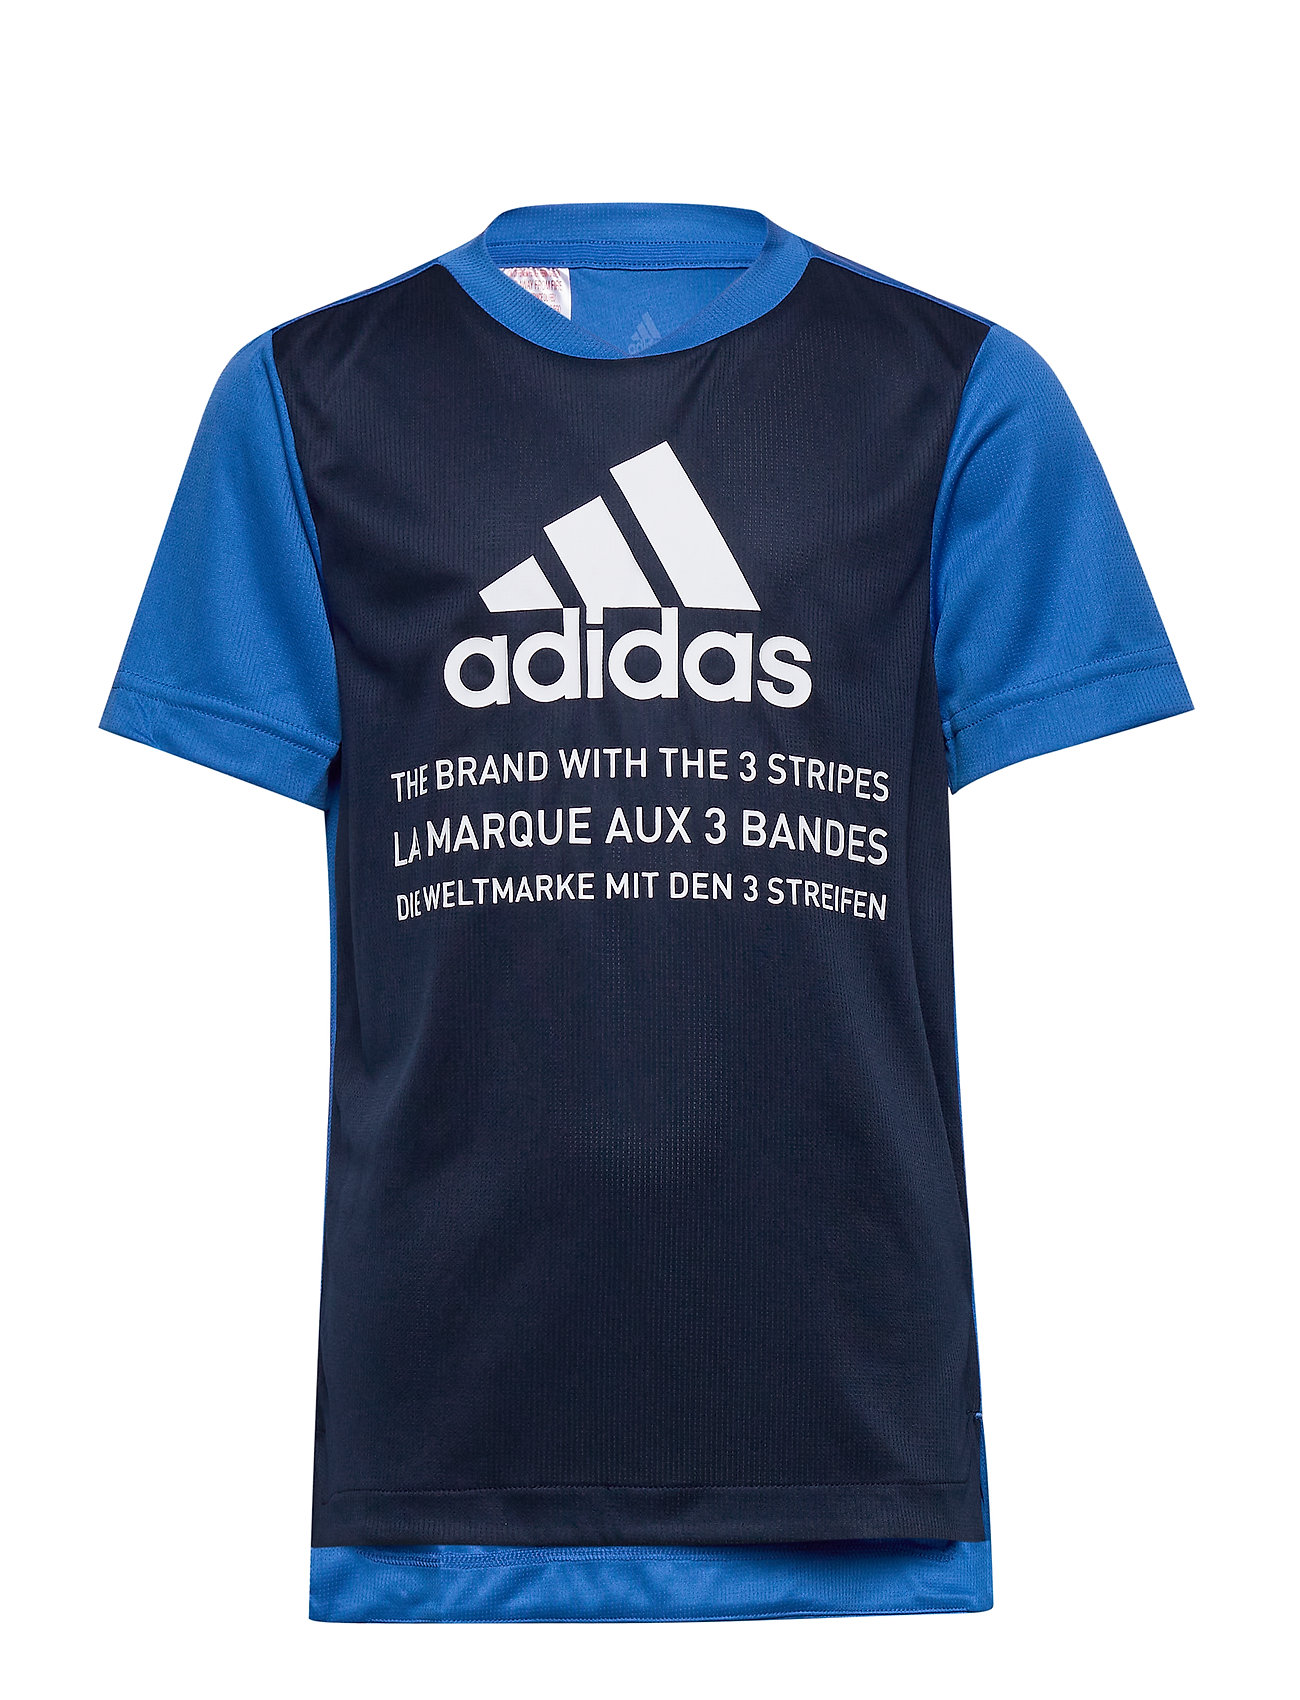 Image of Jb Tr Tee V1 T-shirt Blå Adidas Performance (3406257377)